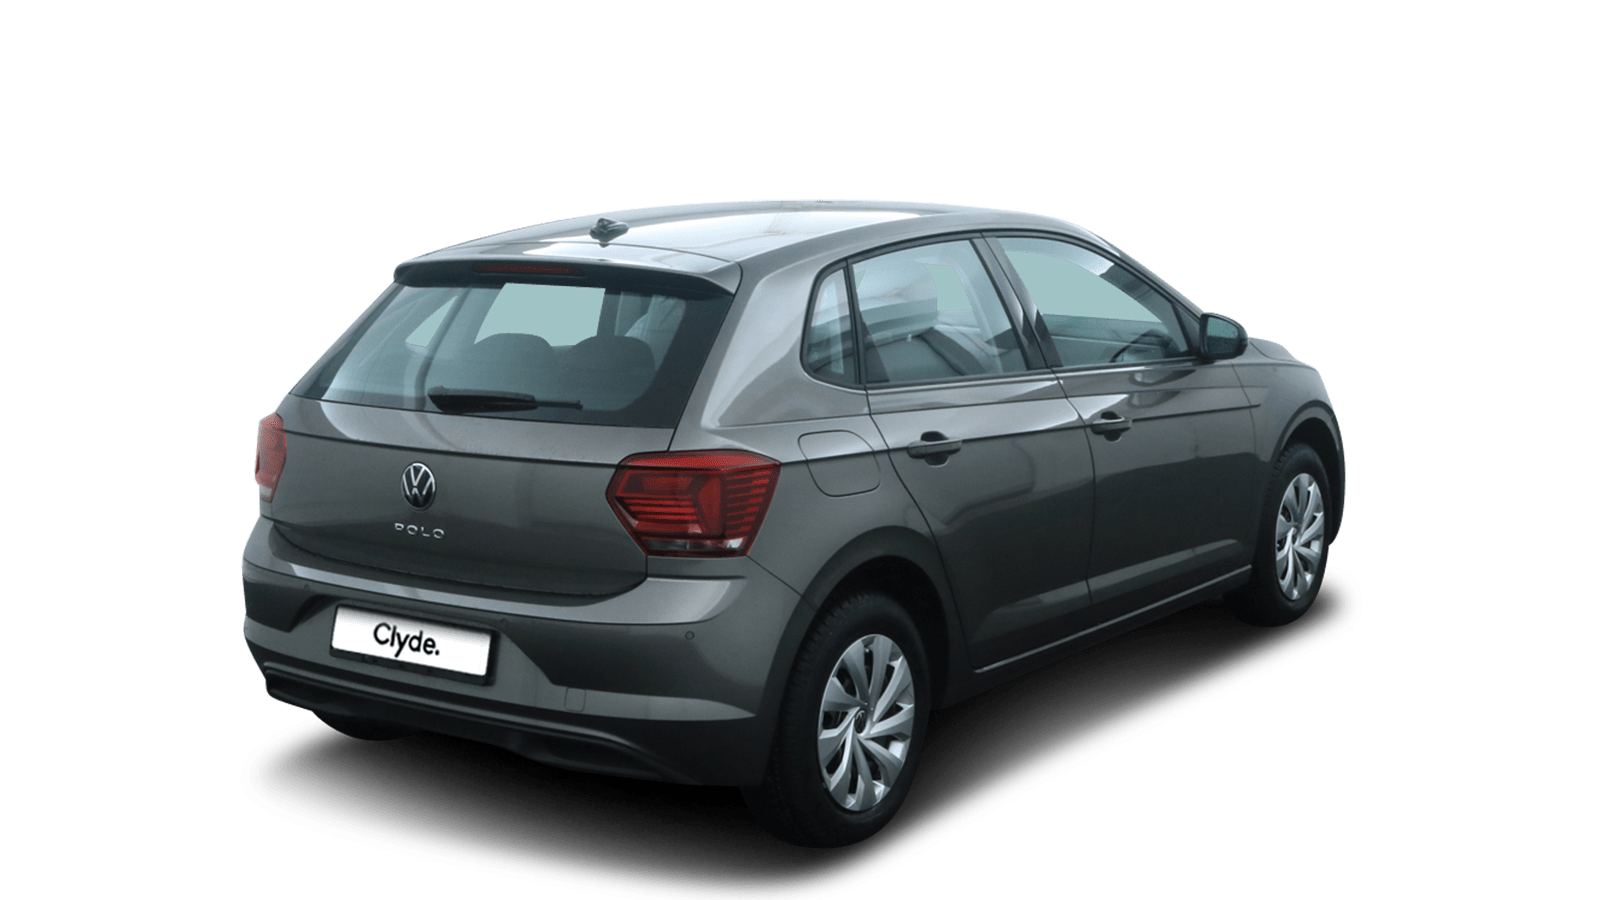 VW Polo Grey back - Clyde car subscription